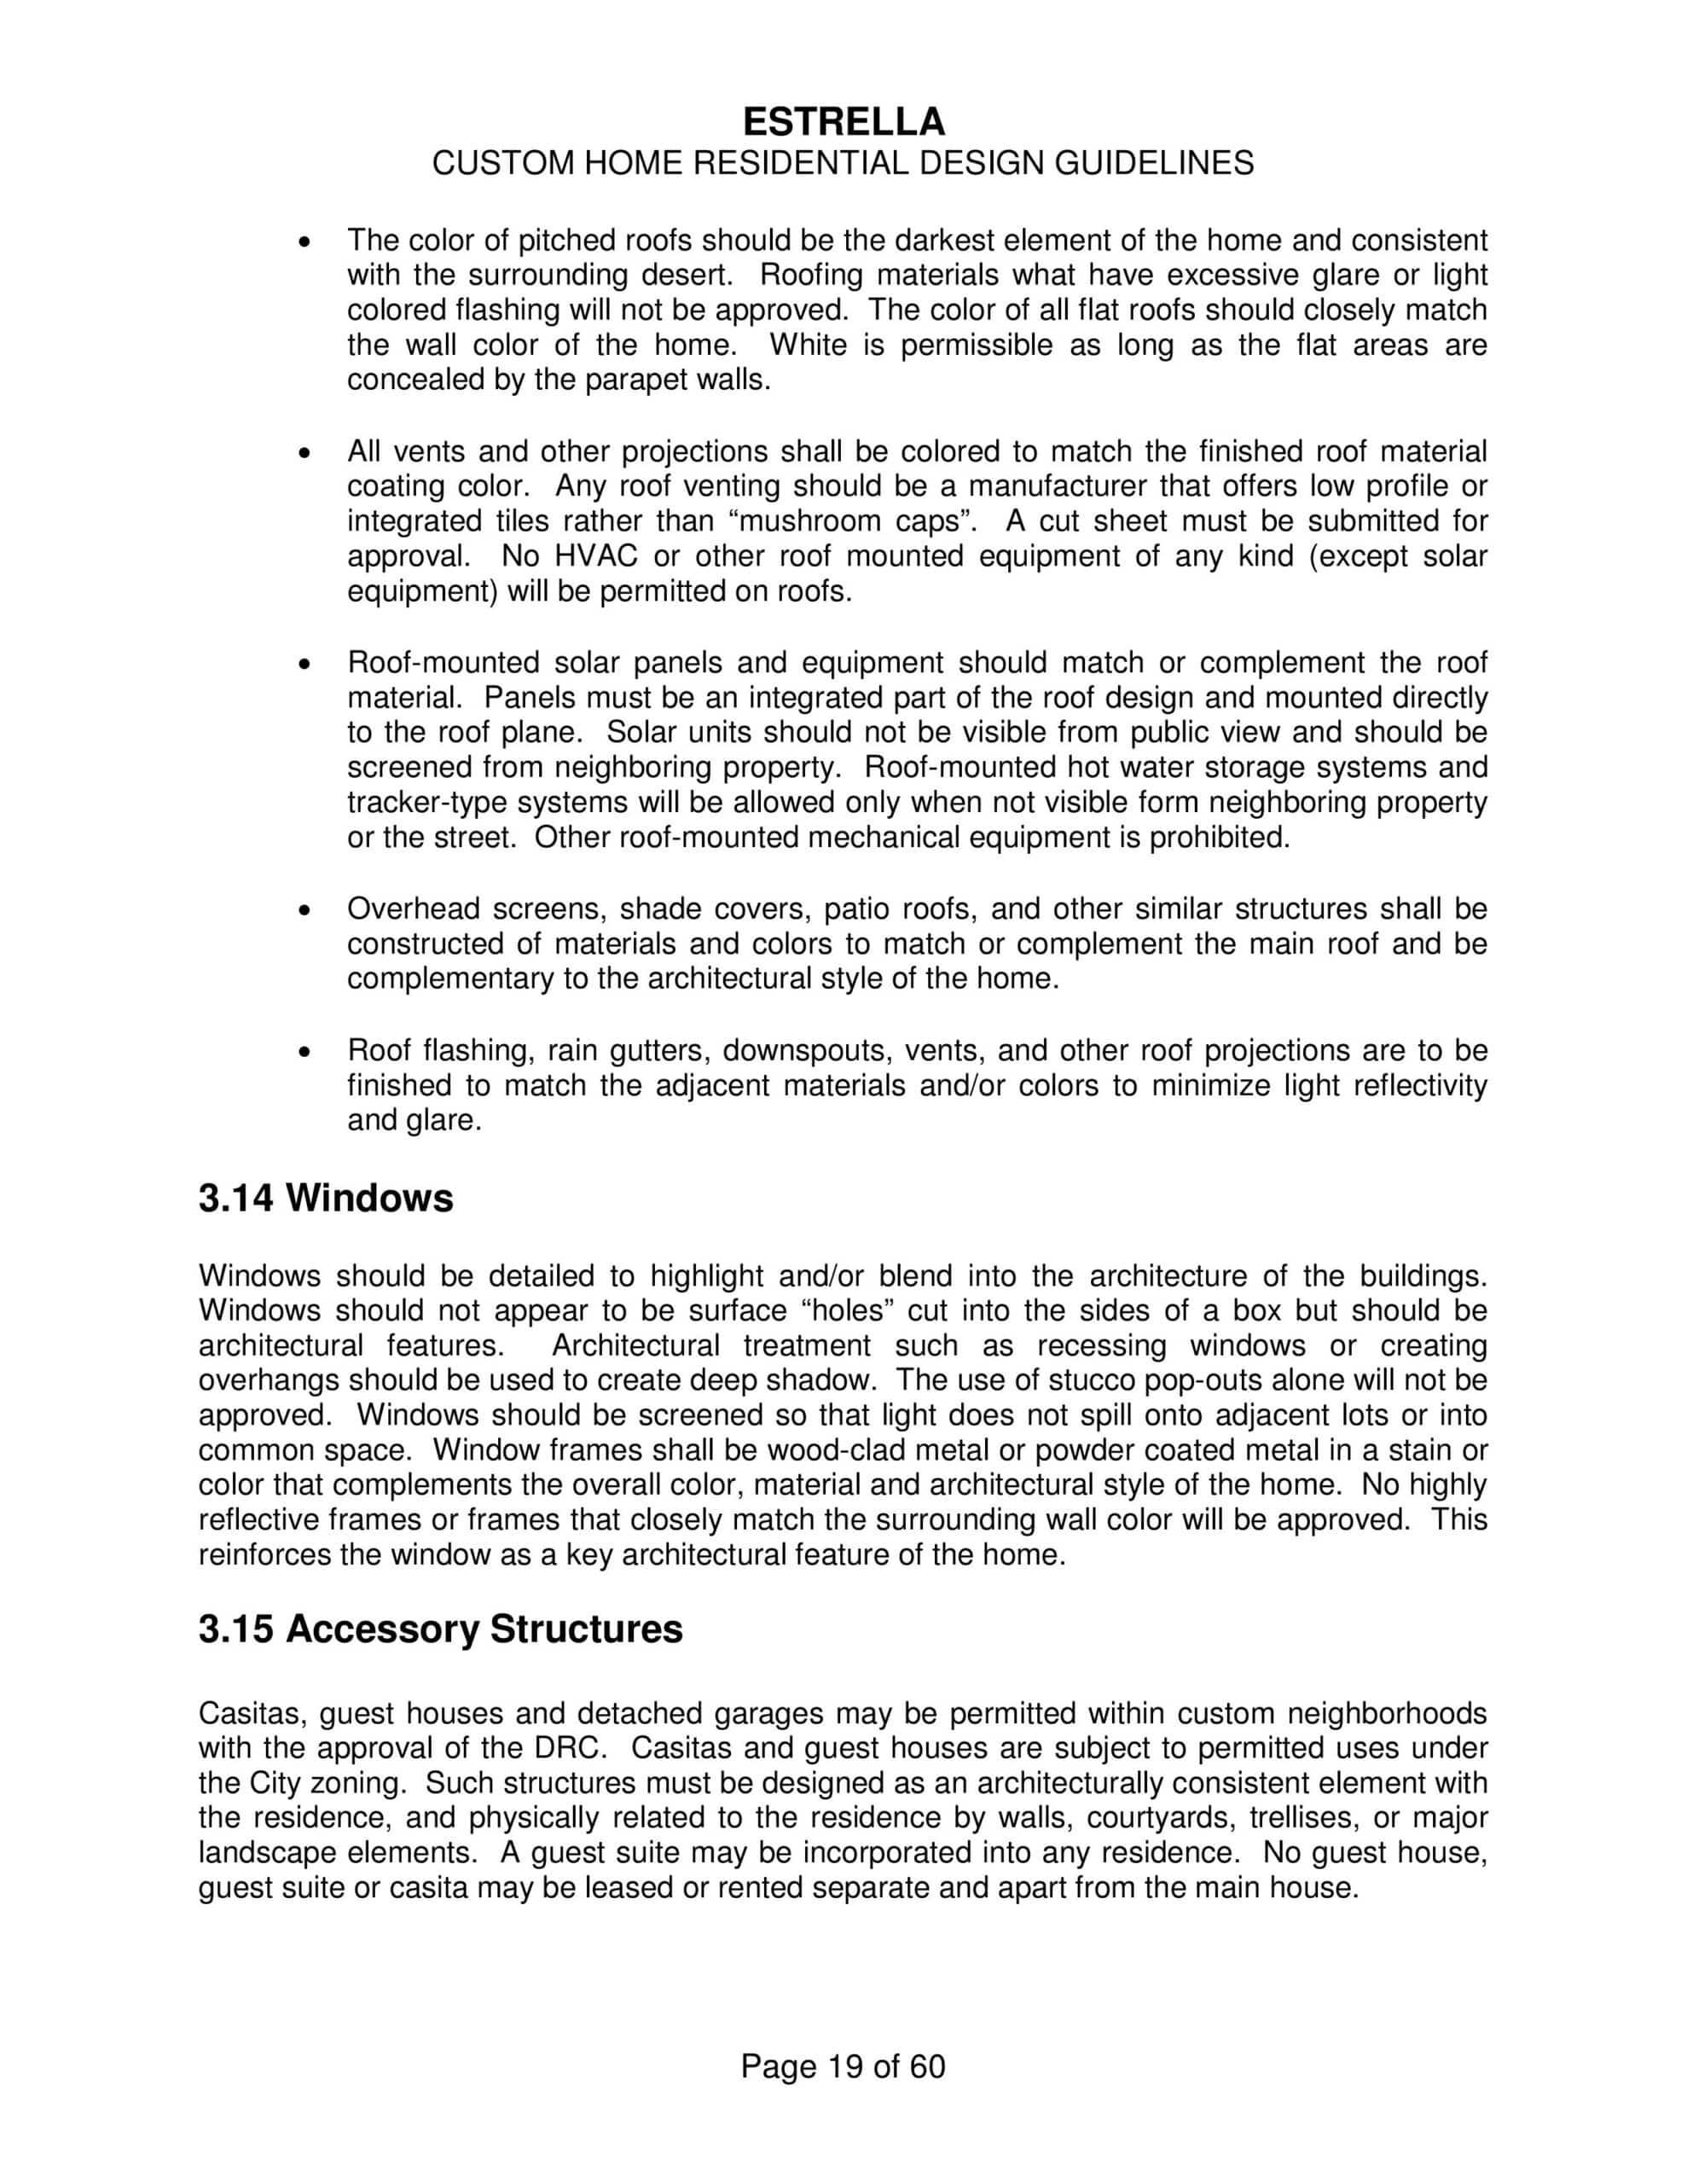 ESTRELLA MOUNTAIN CUSTOM HOME GUIDELINES-page-023